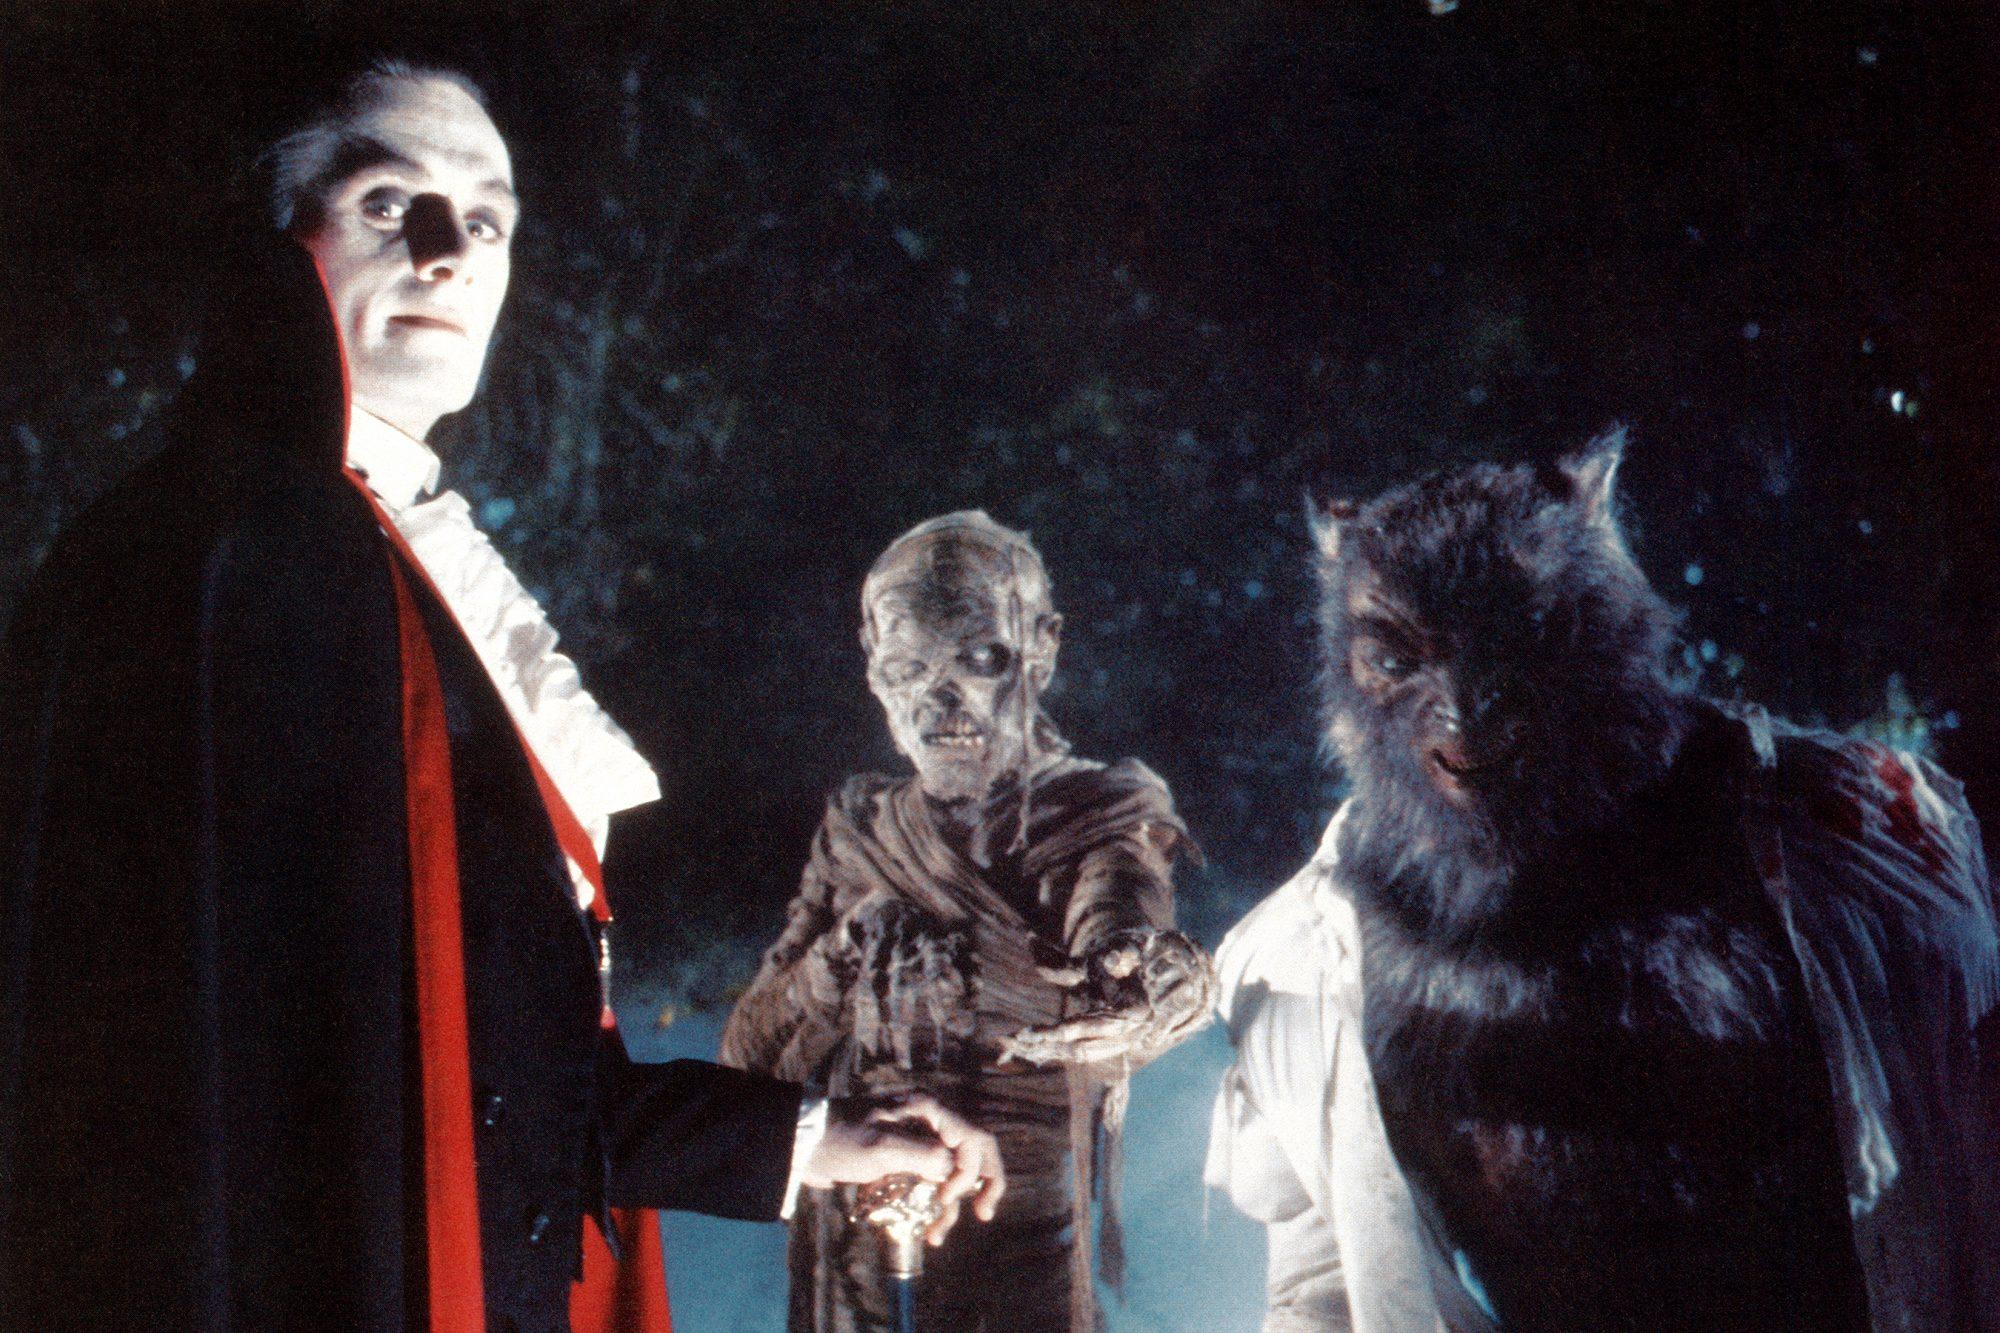 THE MONSTER SQUAD, Duncan Regehr, Michael Reid MacKay, Carl Thibault, 1987, (c)TriStar Pictures/cour